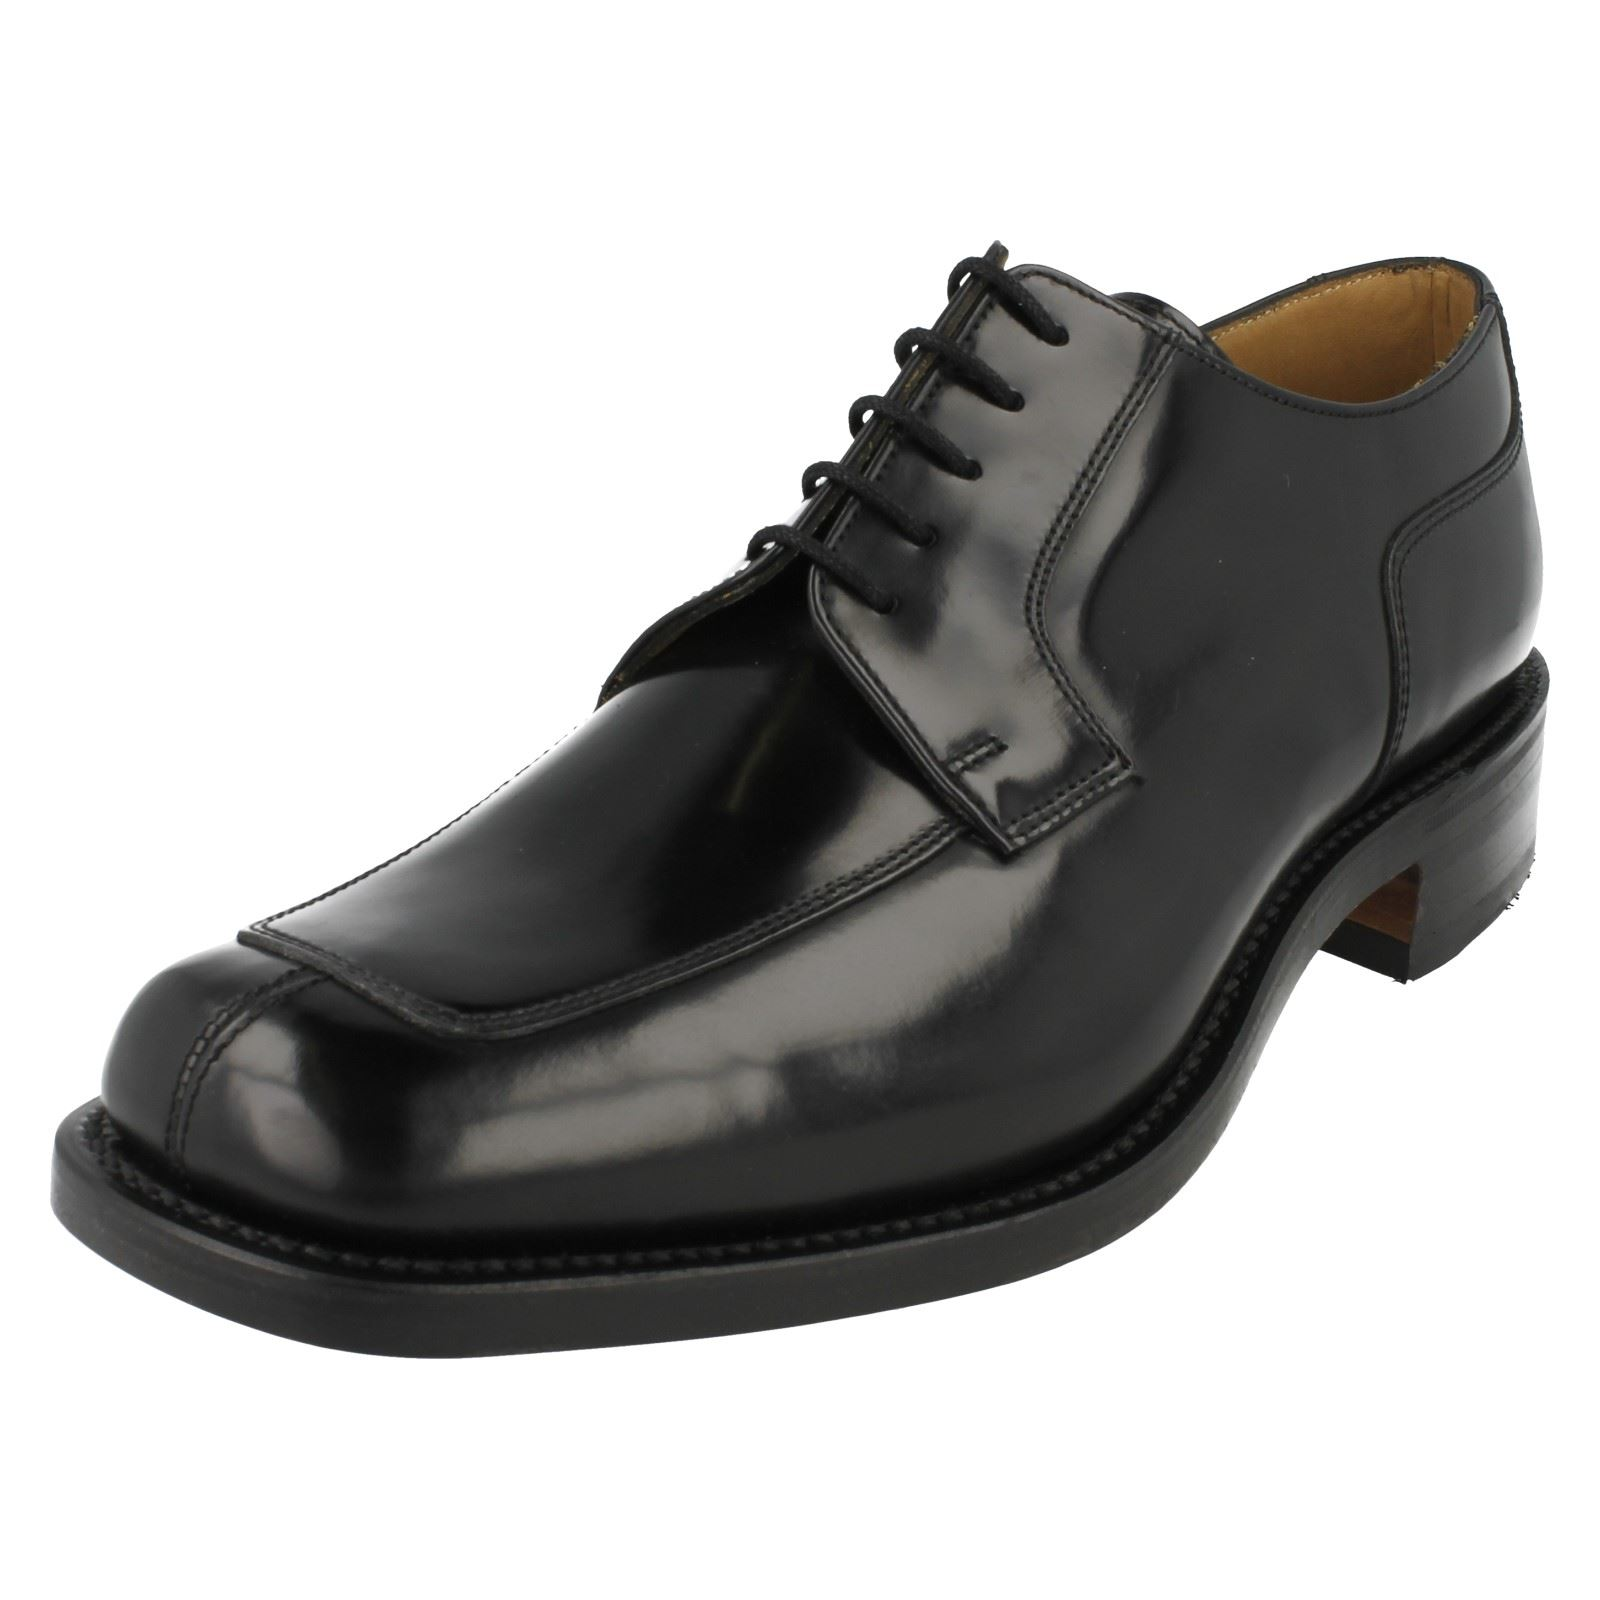 uomo pelle scarpe 1303b da uomo Loake in di da Stile nera wqU1nRBPx